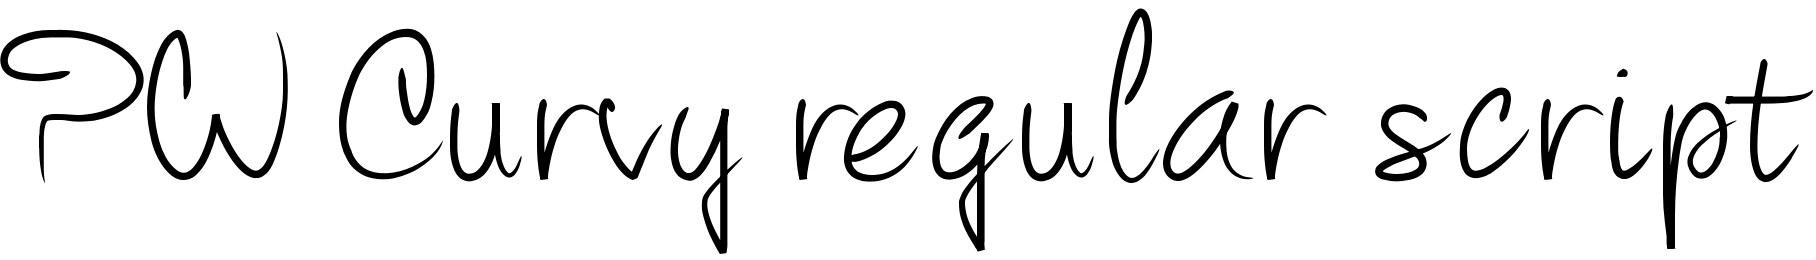 PW Curvy regular script